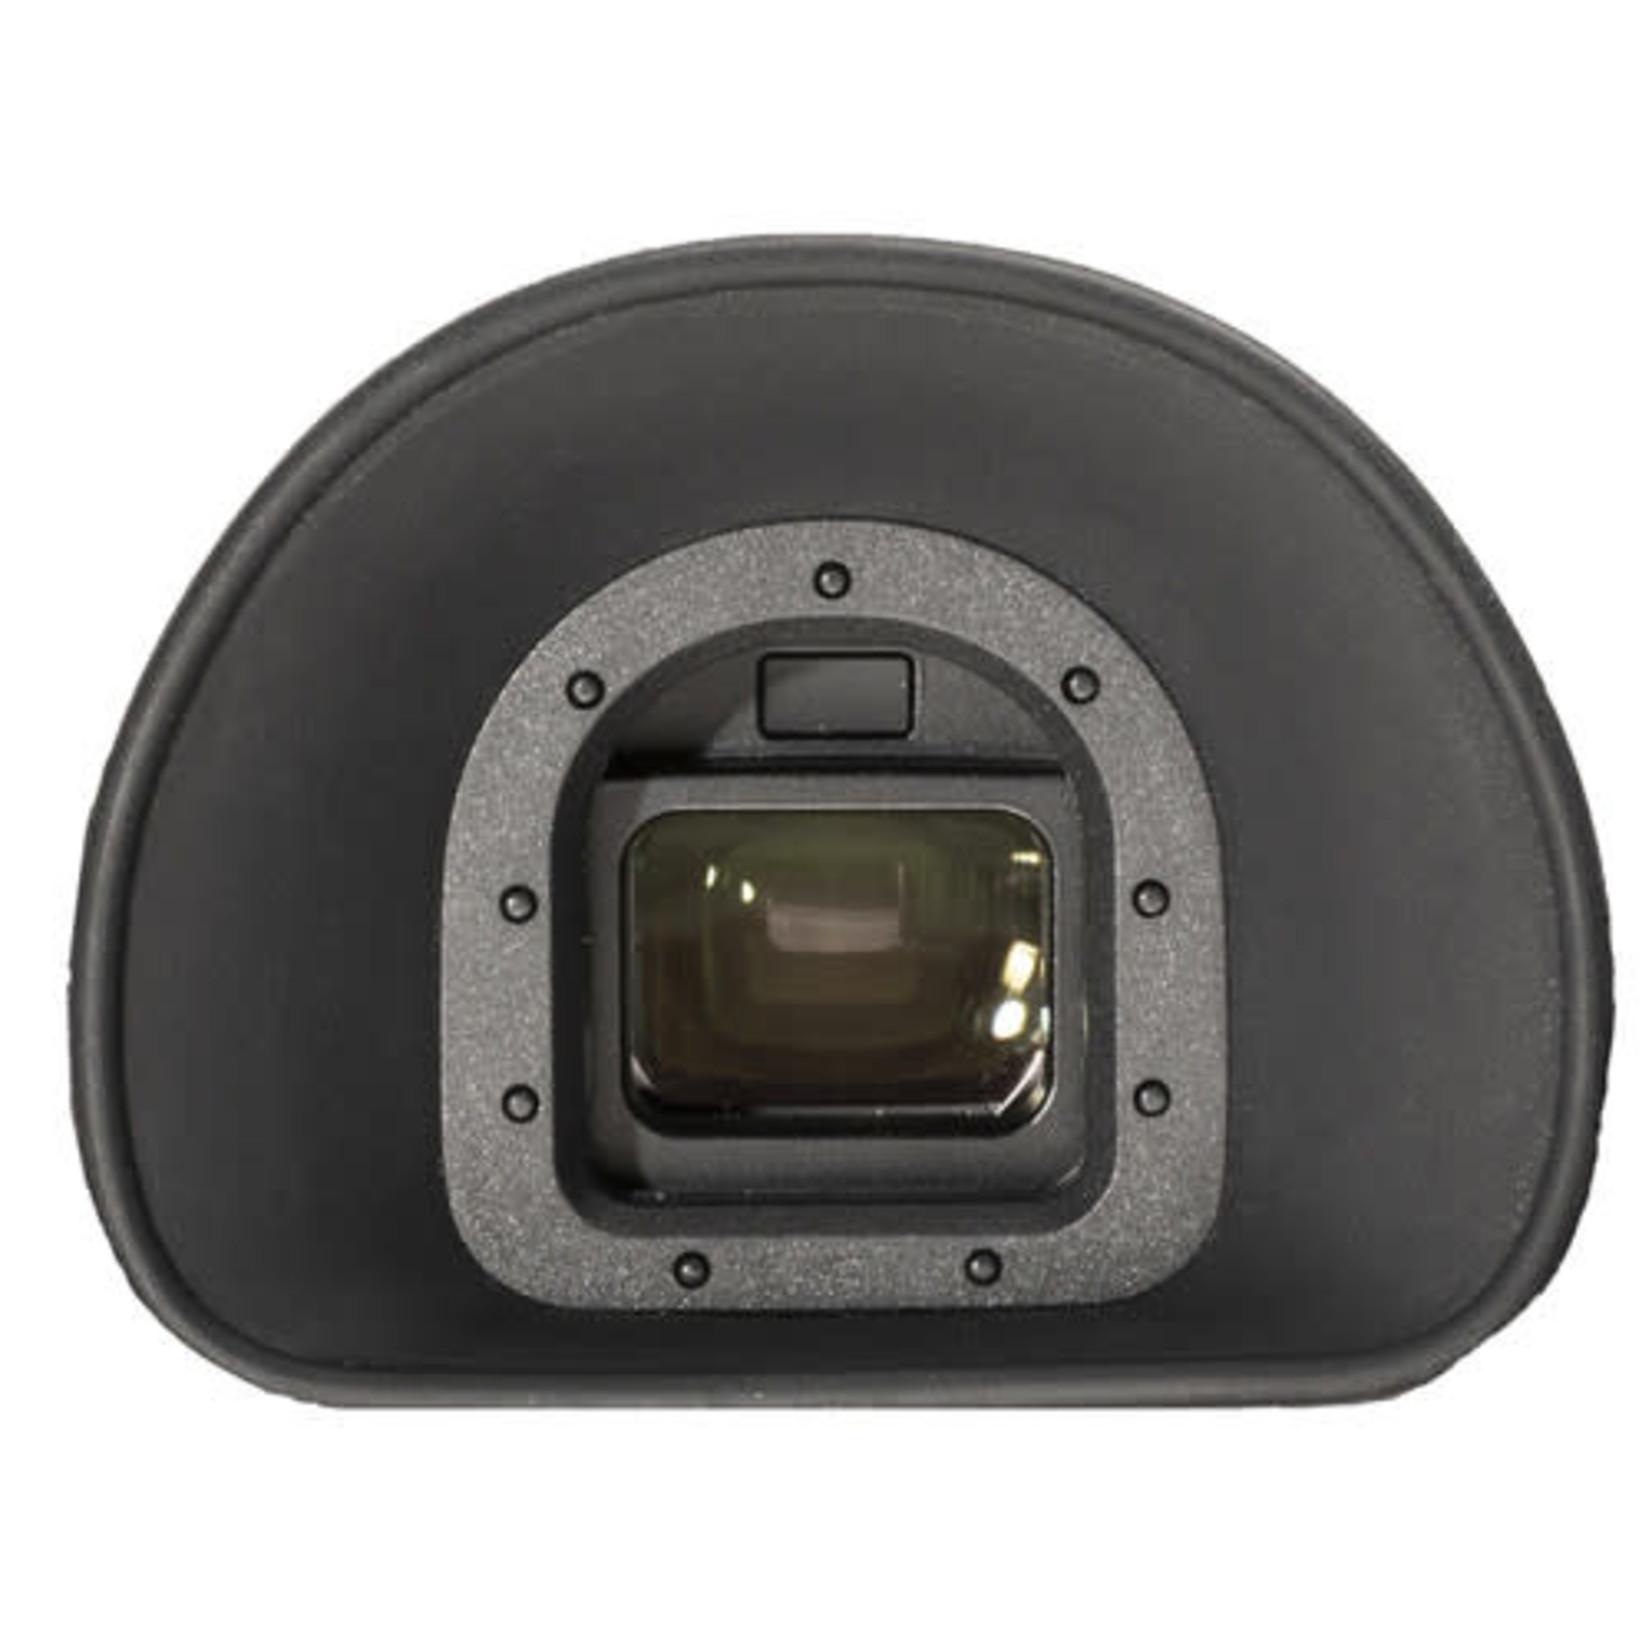 Hoodman HoodEYE Oversized eyecup for Nikon Z Cameras